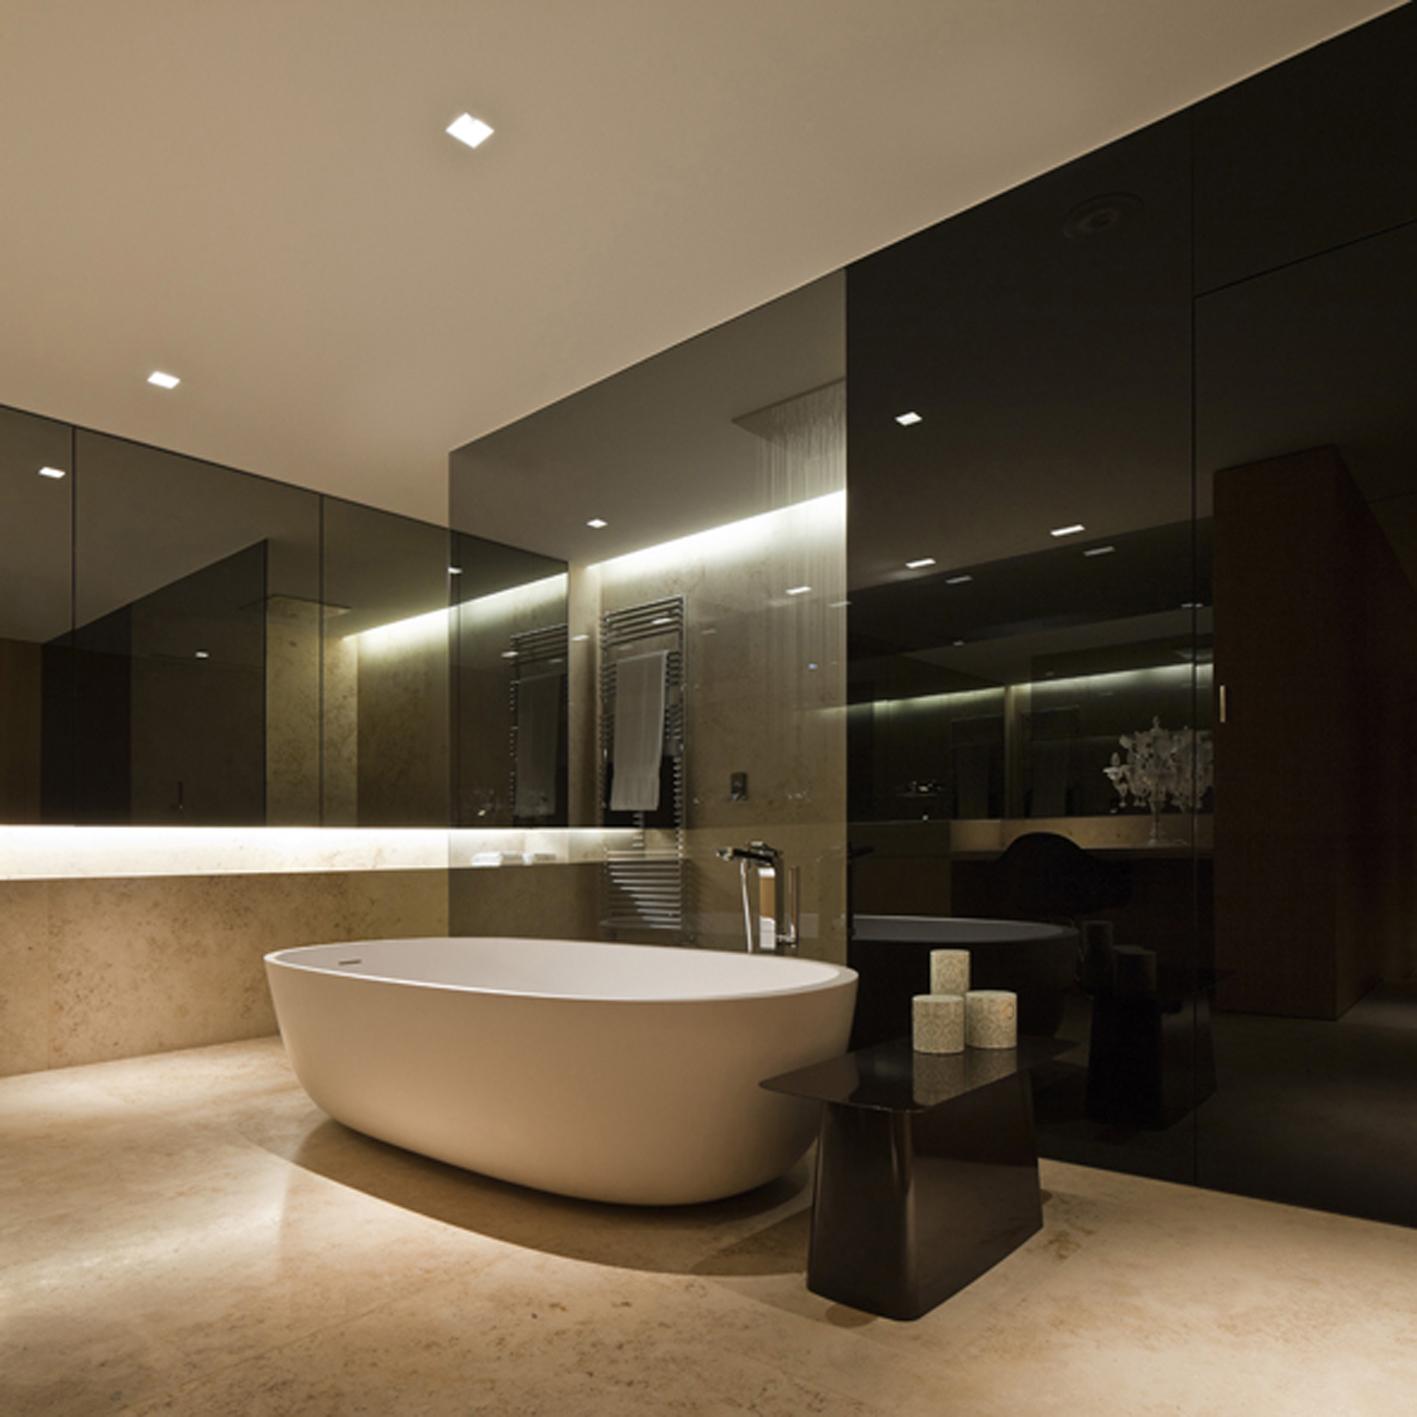 Apartamento Cg Francesc Rif Studio Archdaily Brasil